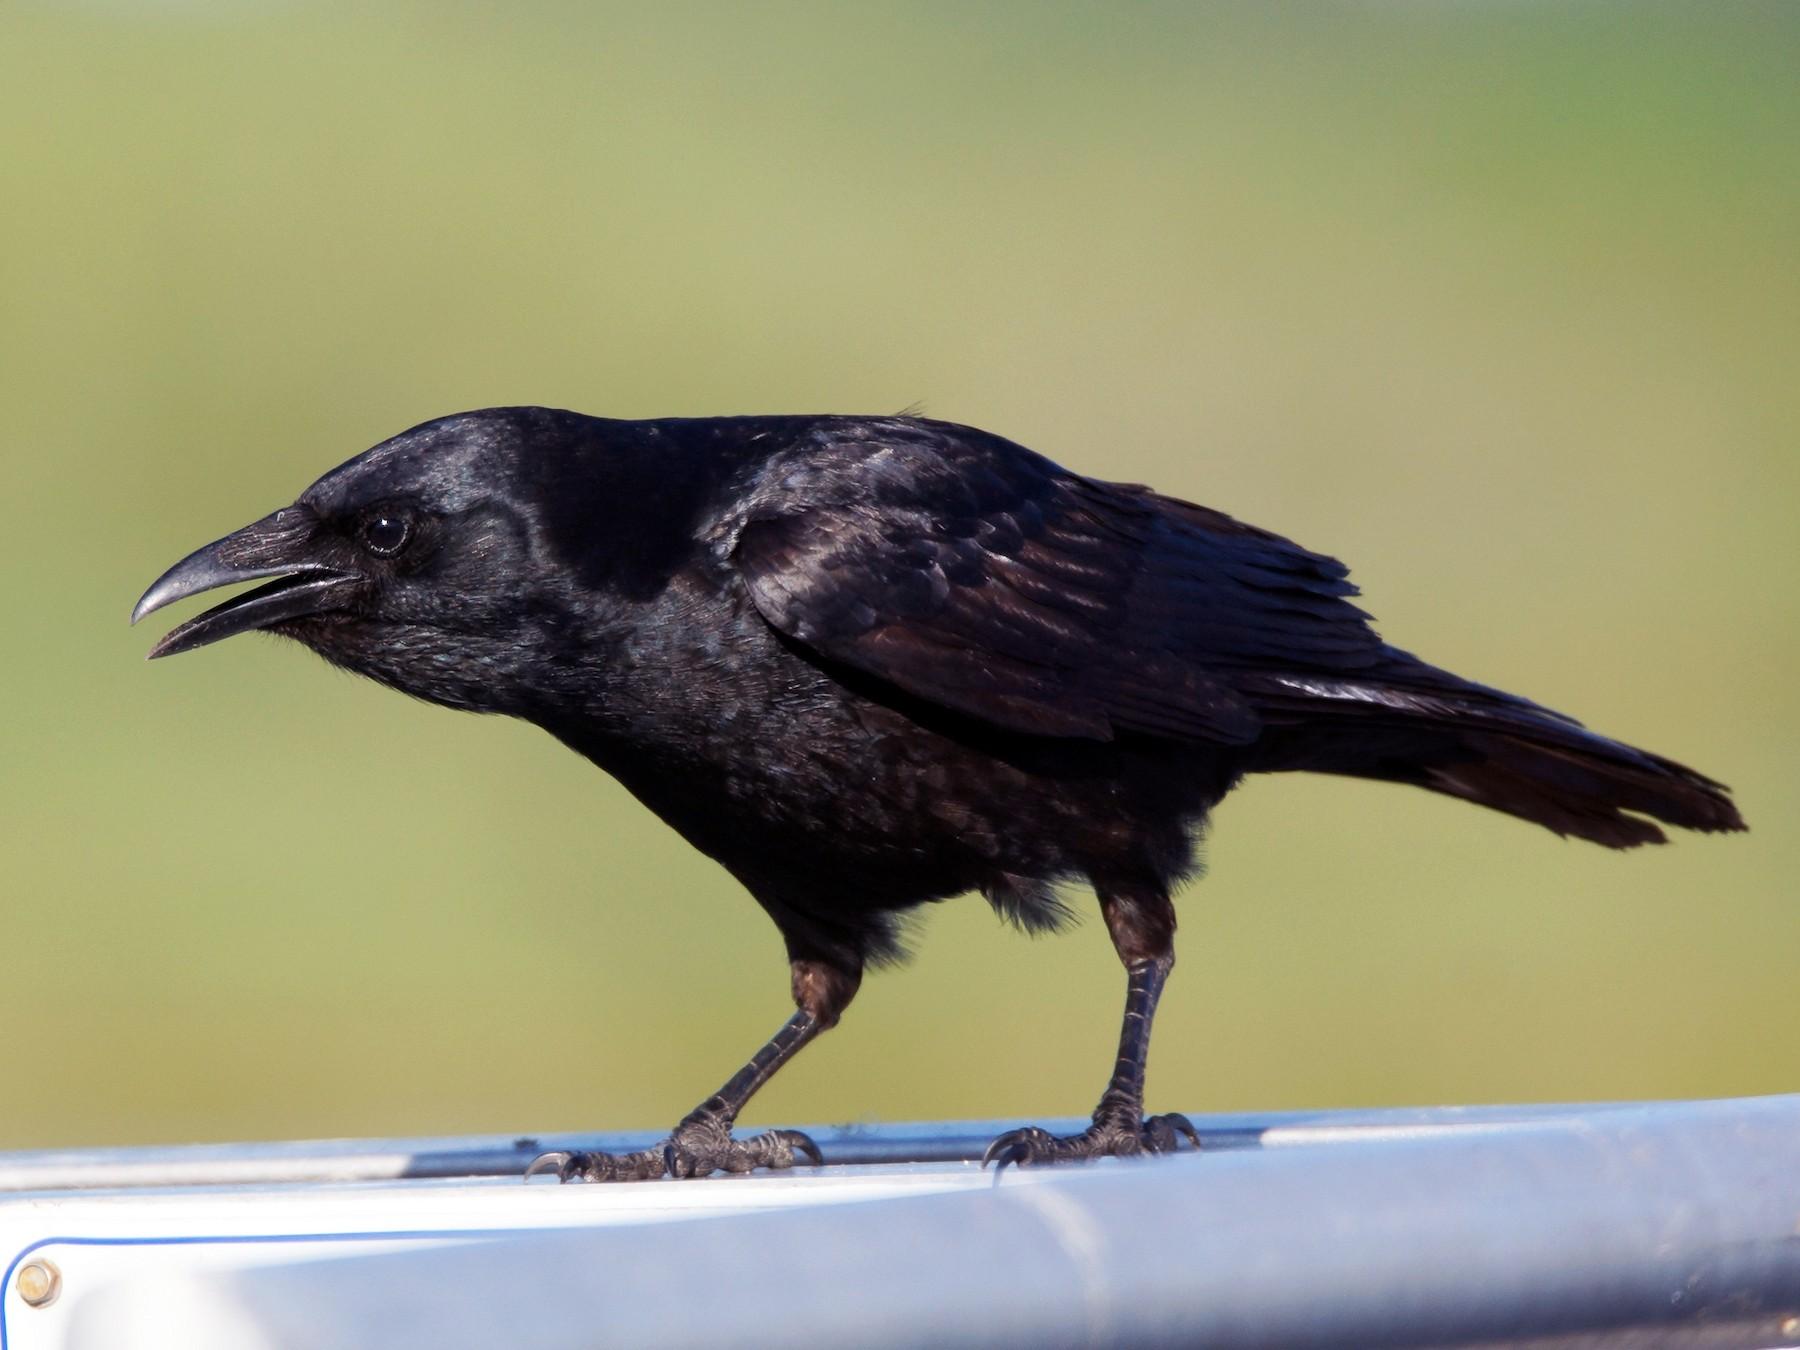 Fish Crow - Steve Percival